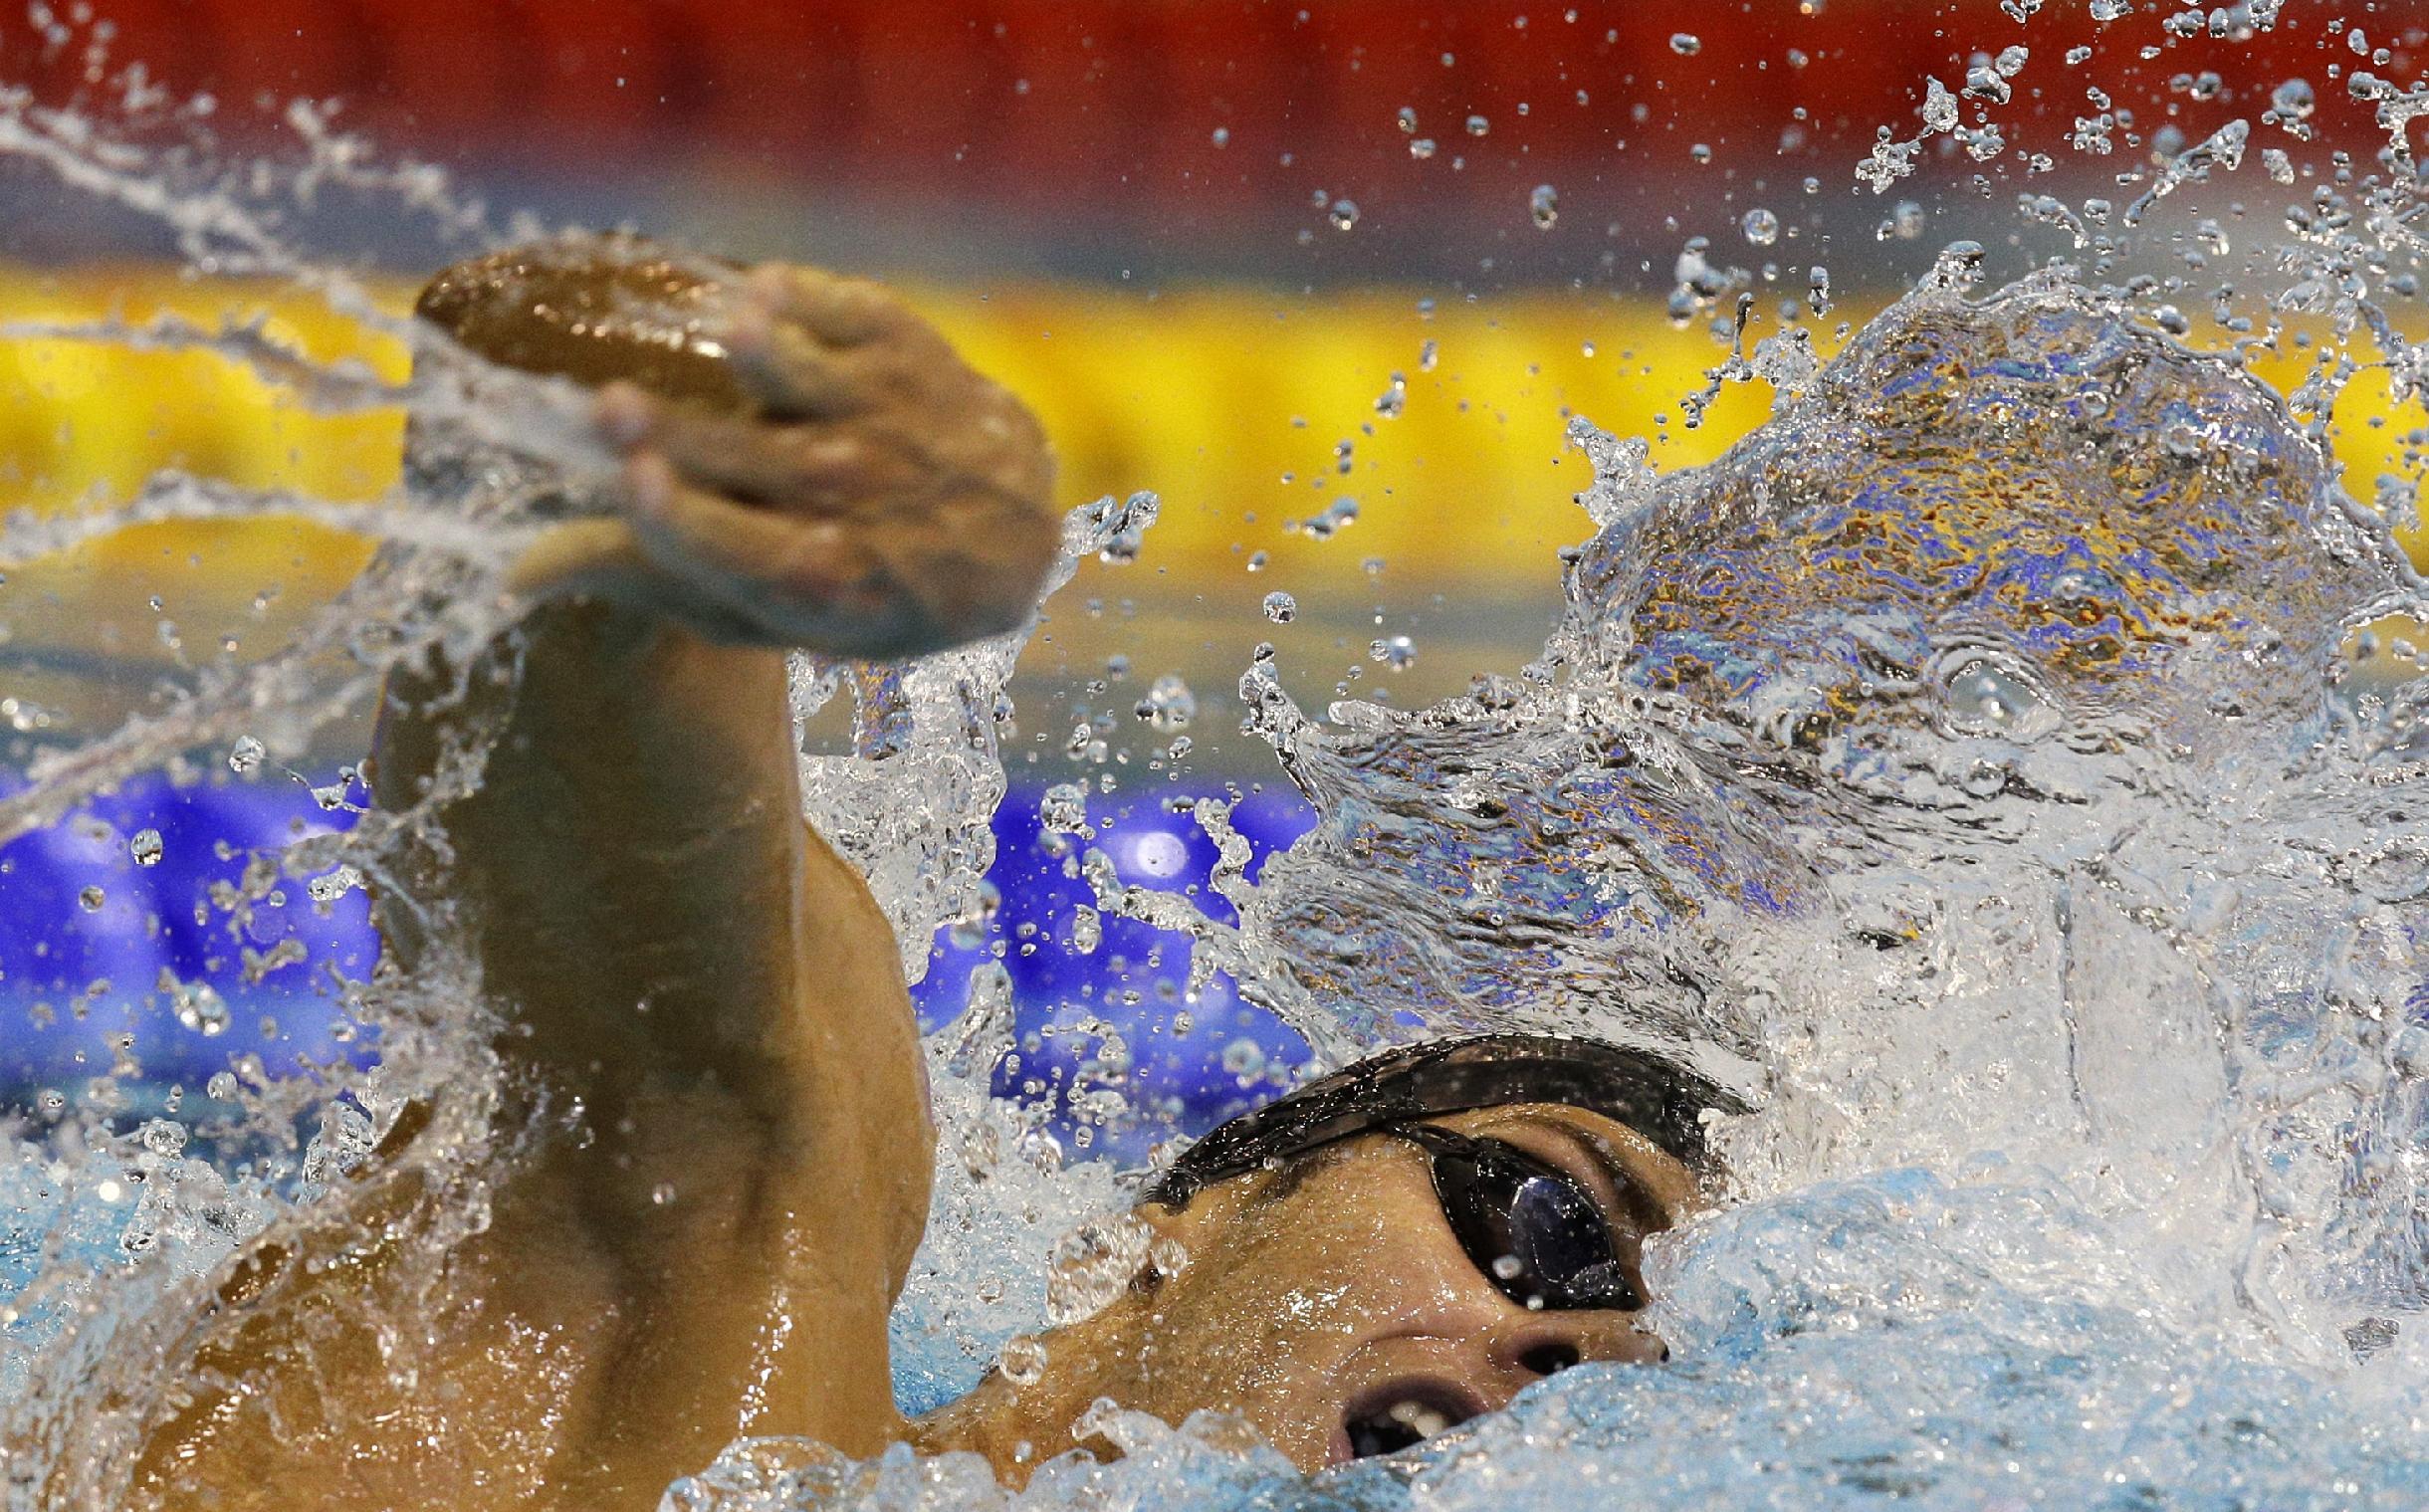 Adam Peaty sets 50 breaststroke swim world mark